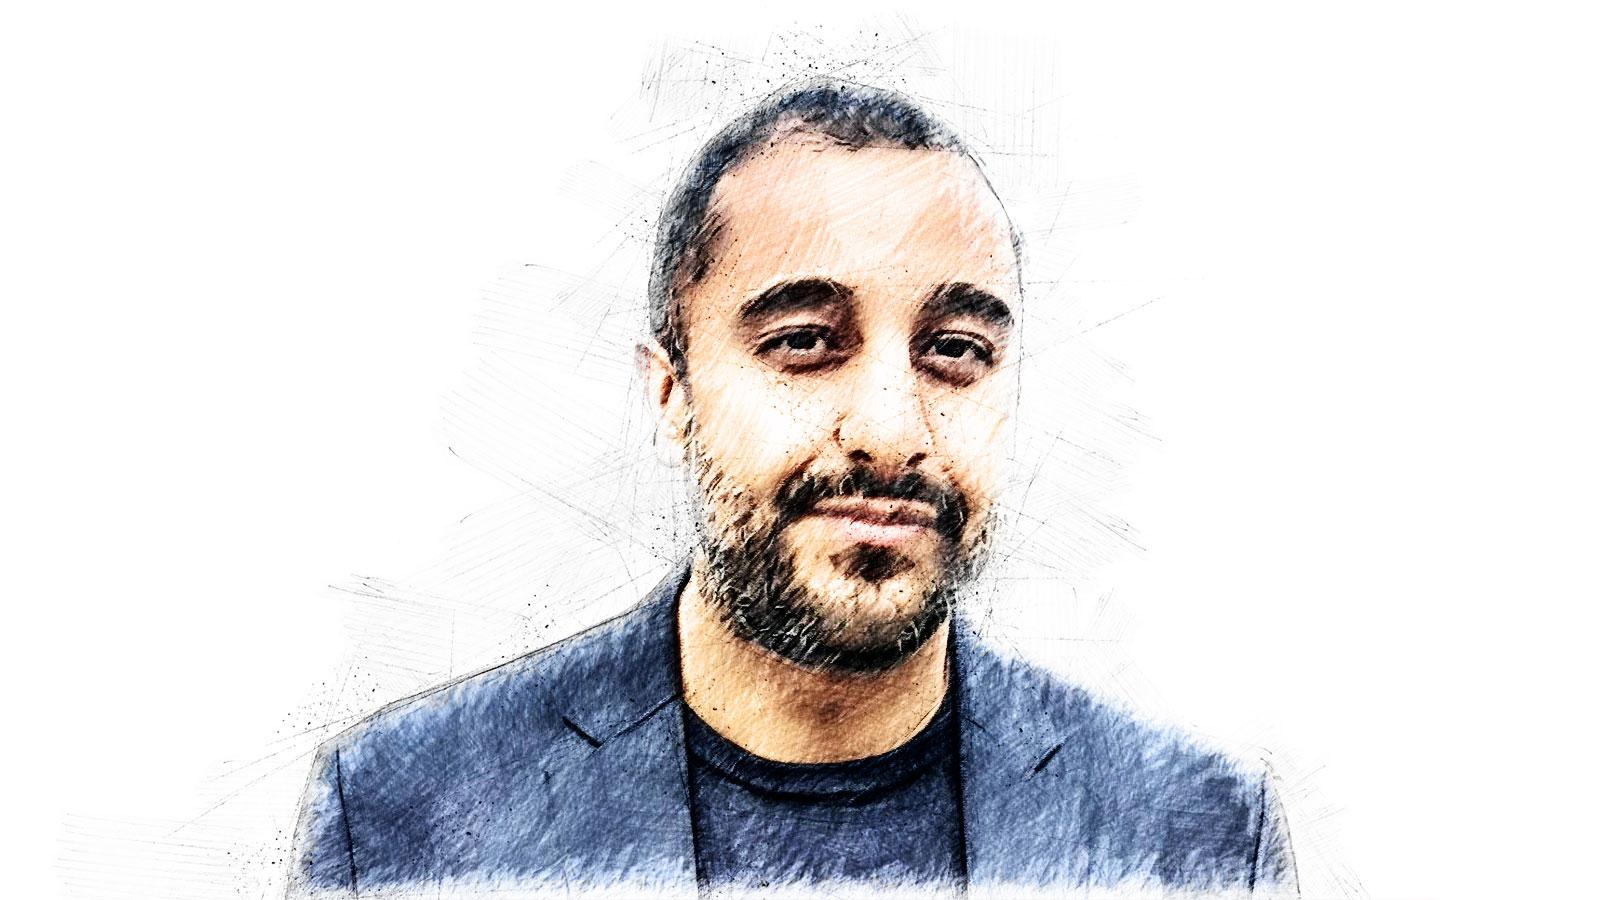 Kaveh Yazdani, MiGAZIN, Antisemitismus, Rassismus, Einwanderung, Migration